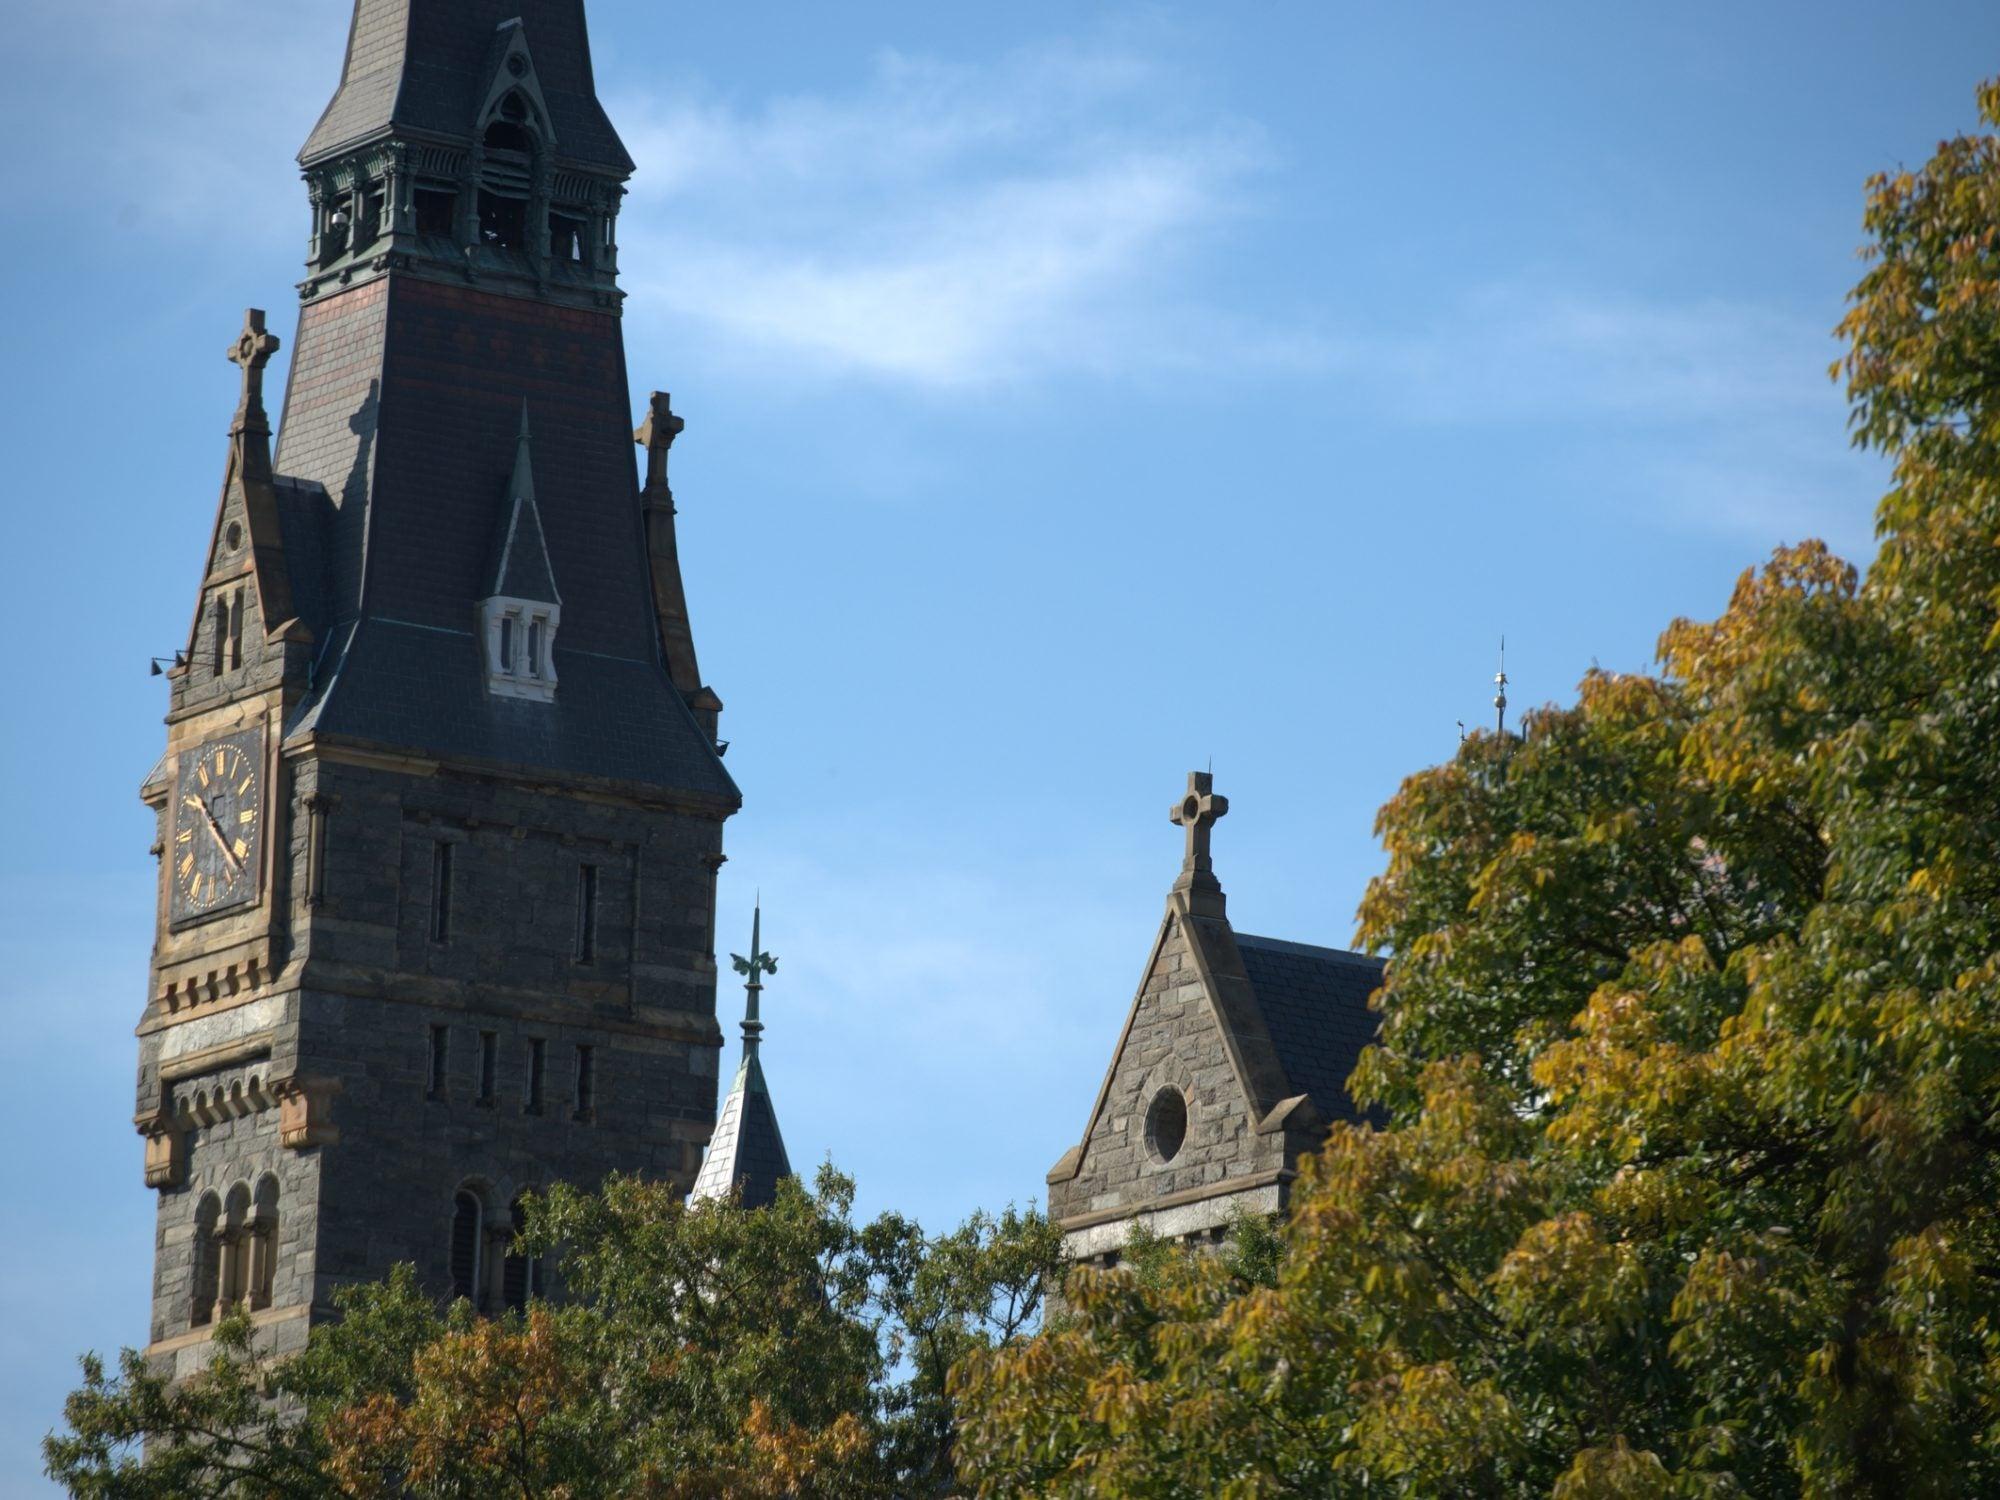 Healy Hall Clock Tower